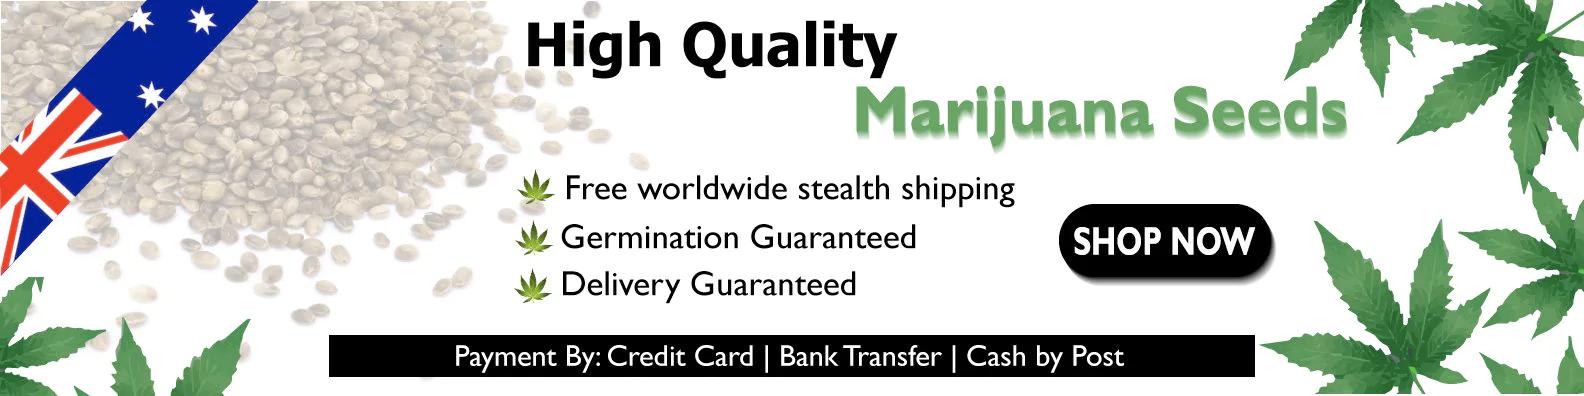 High quality marijuana seeds in Australia